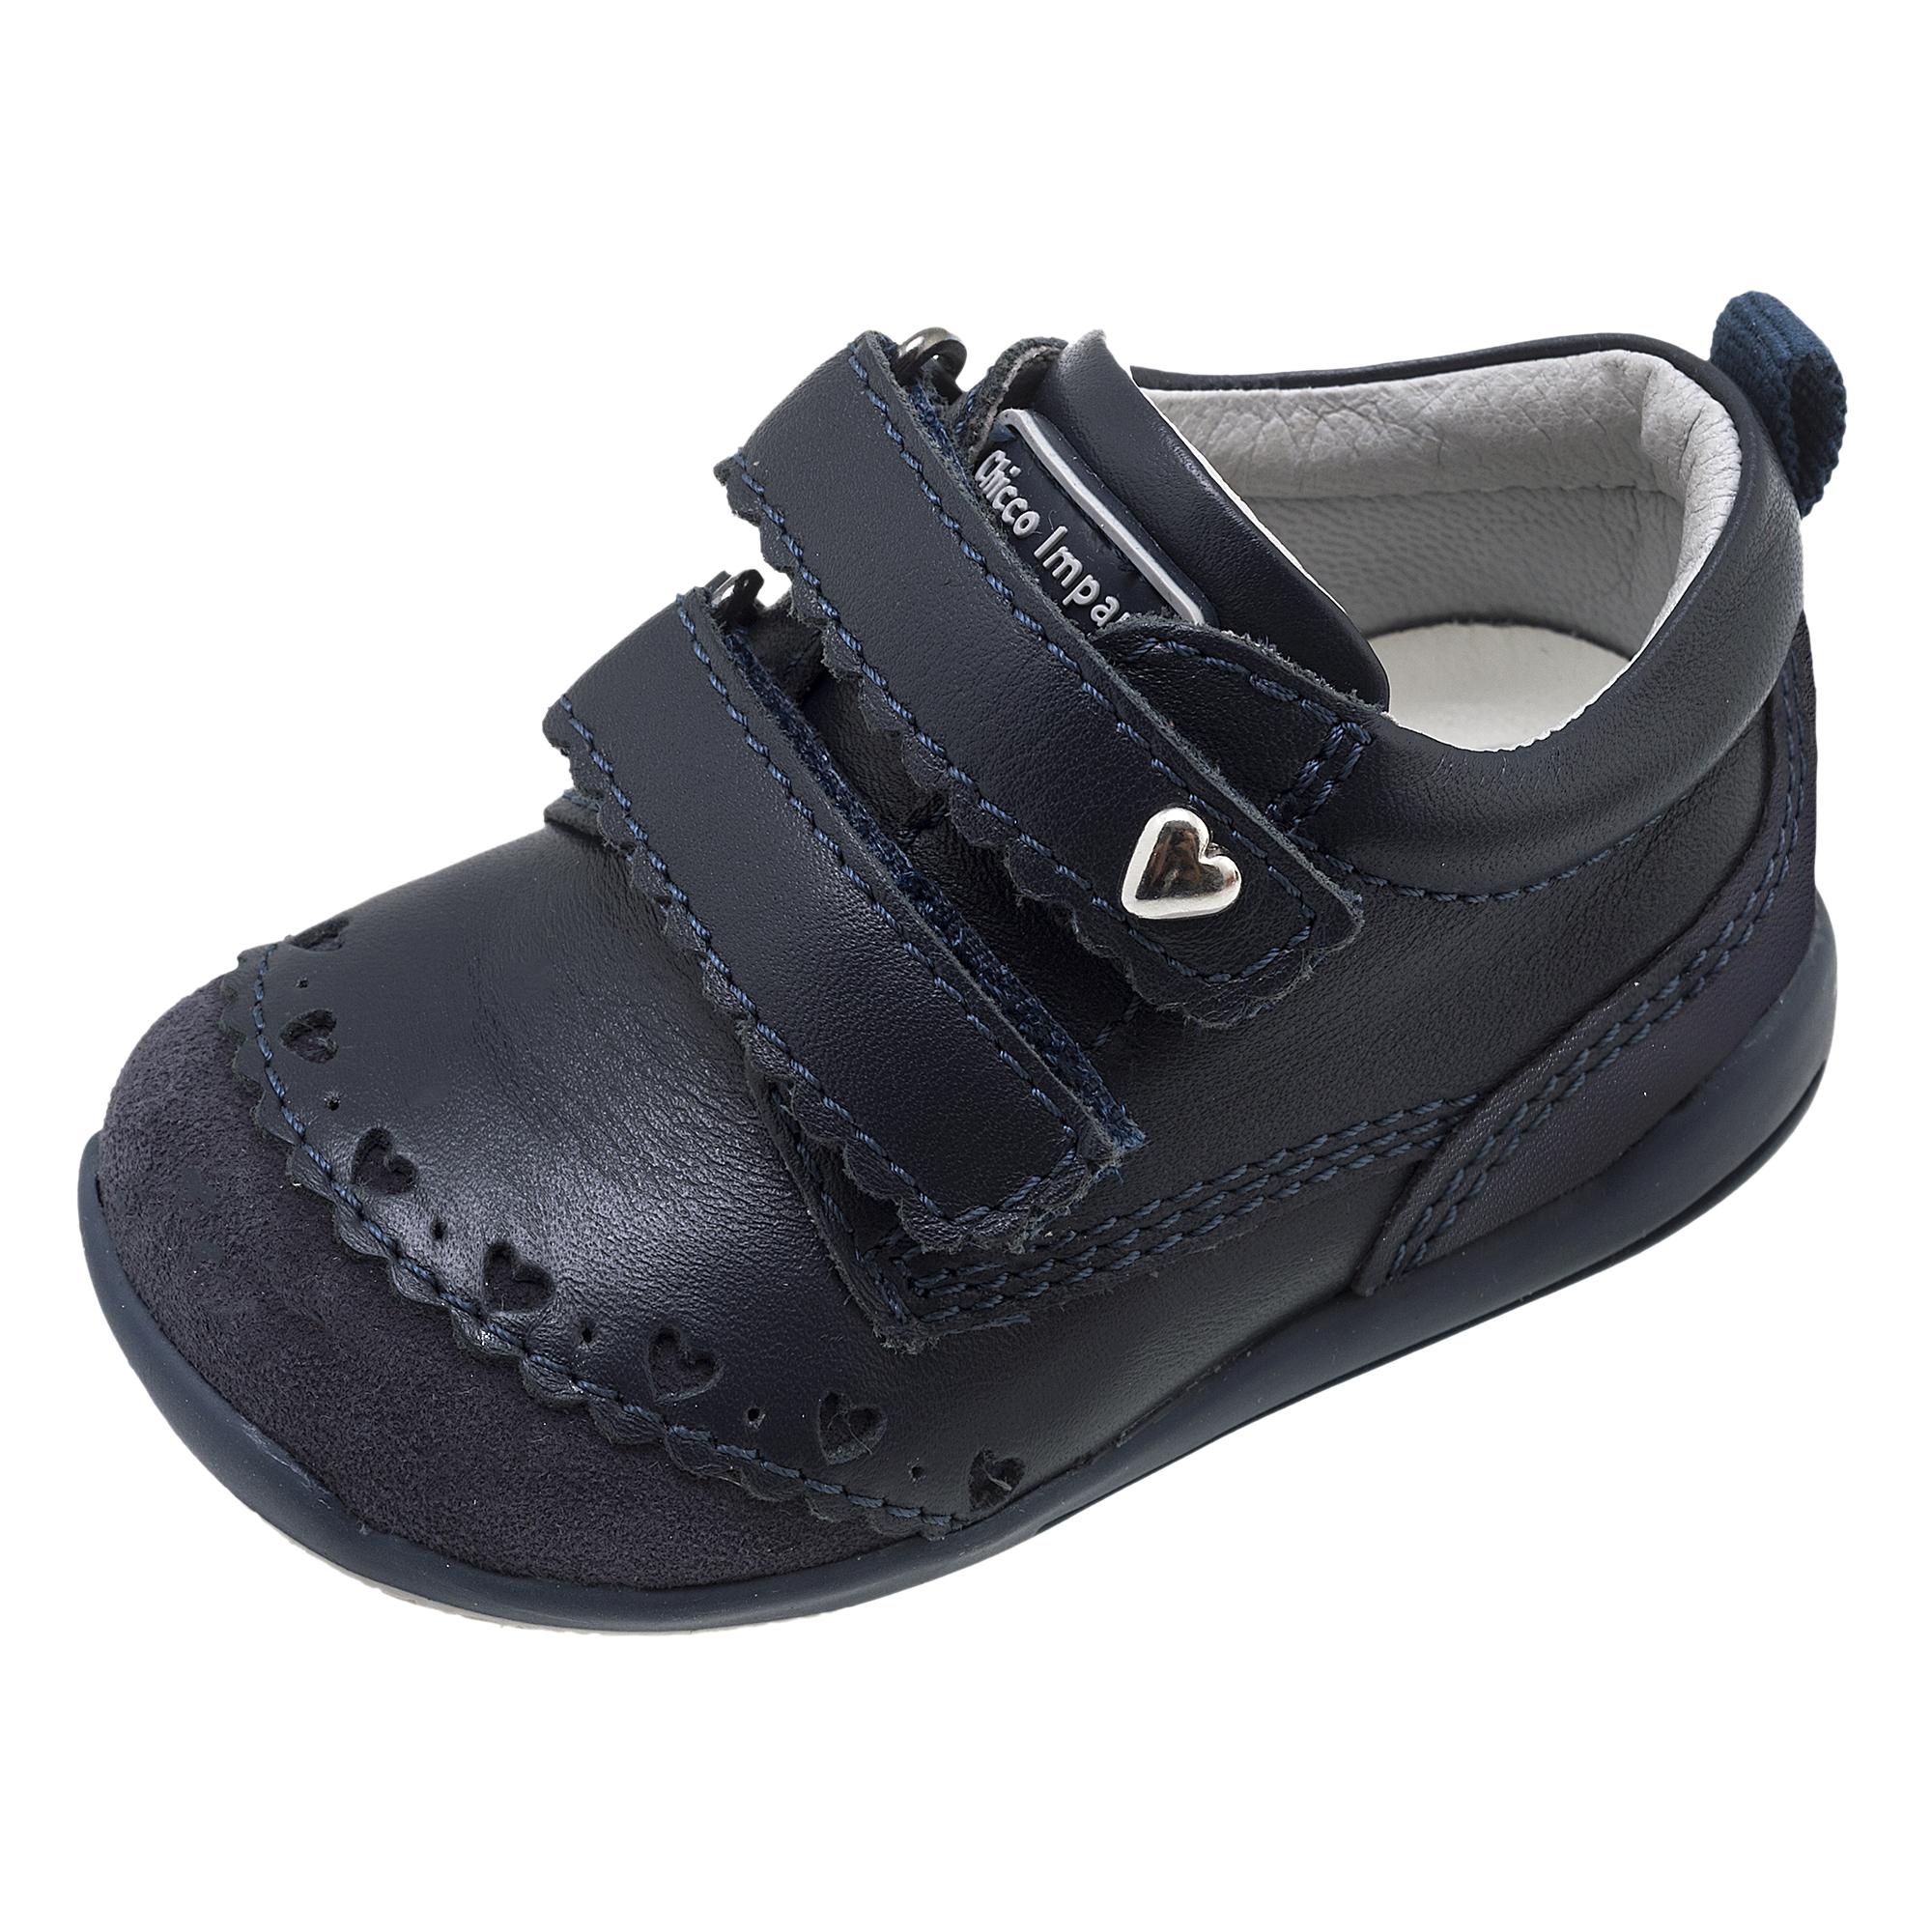 Chicco Pantof copii Chicco bleumarin 22